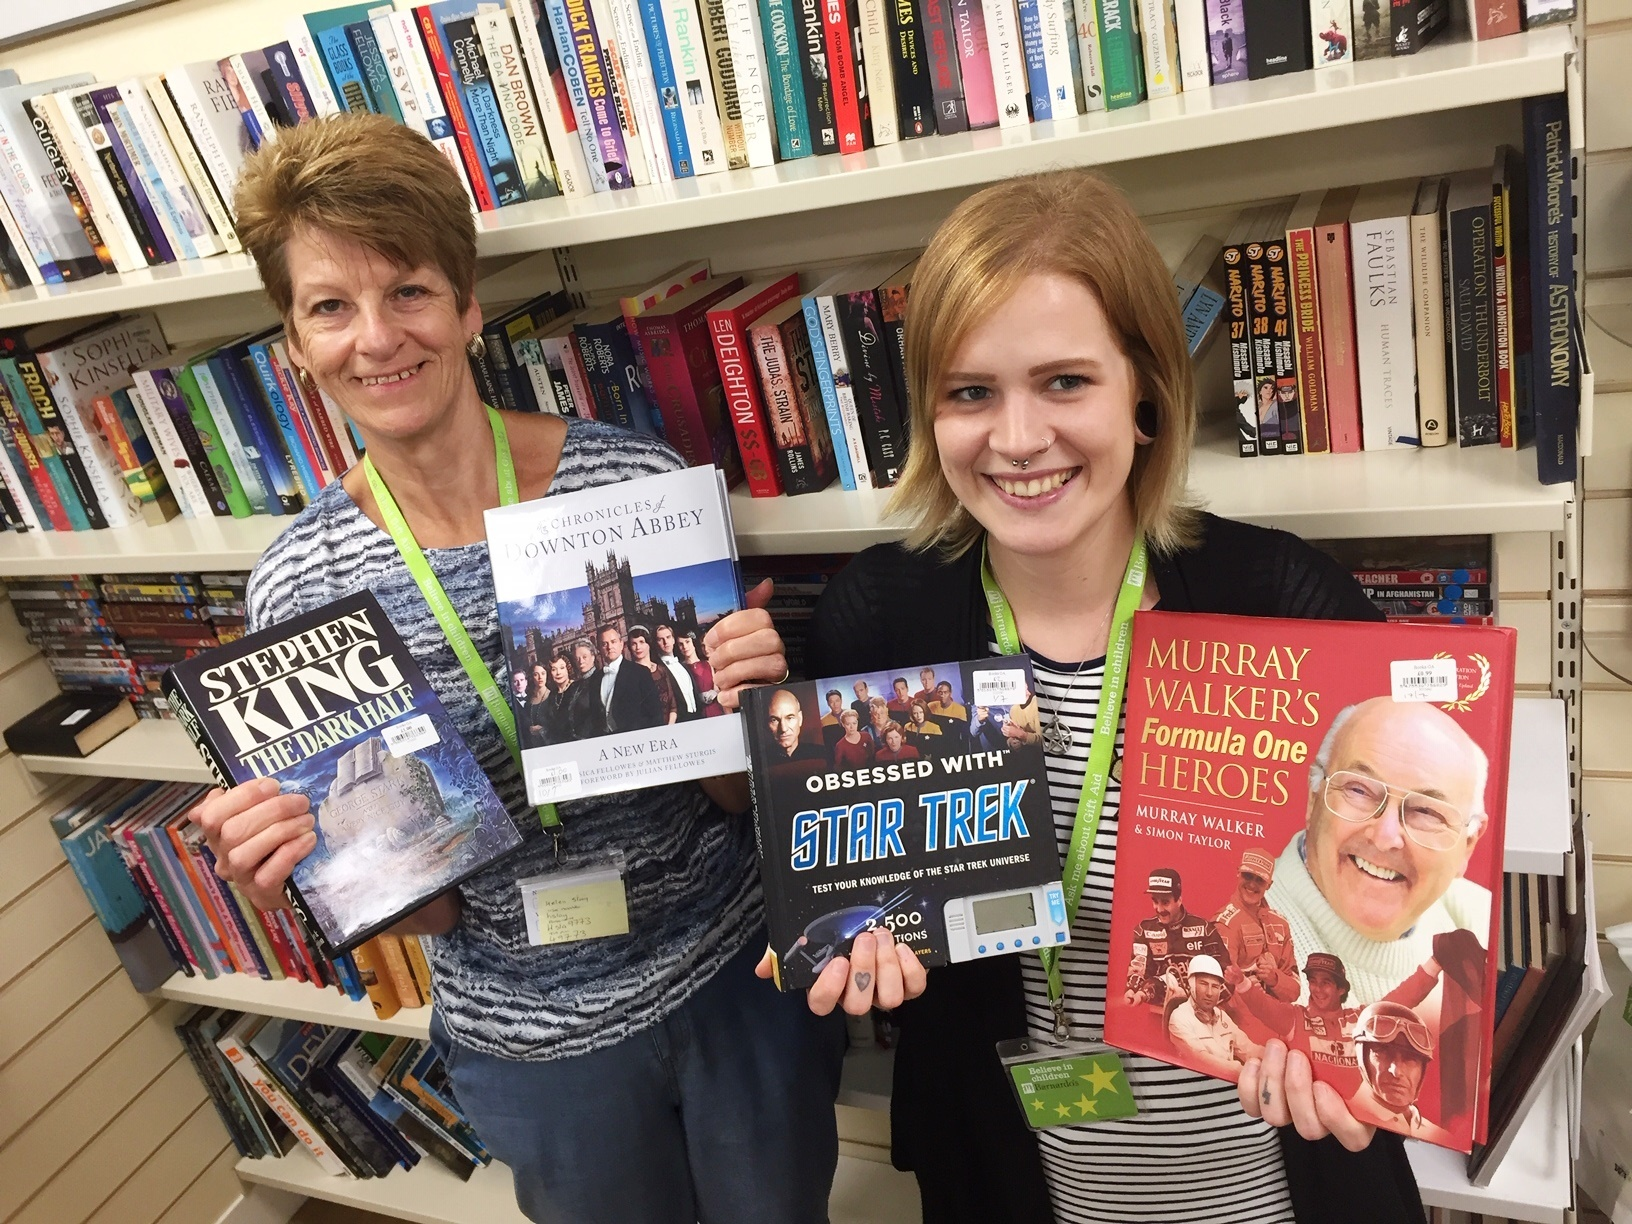 Book bargains on offer at Barnardo's in Westbury